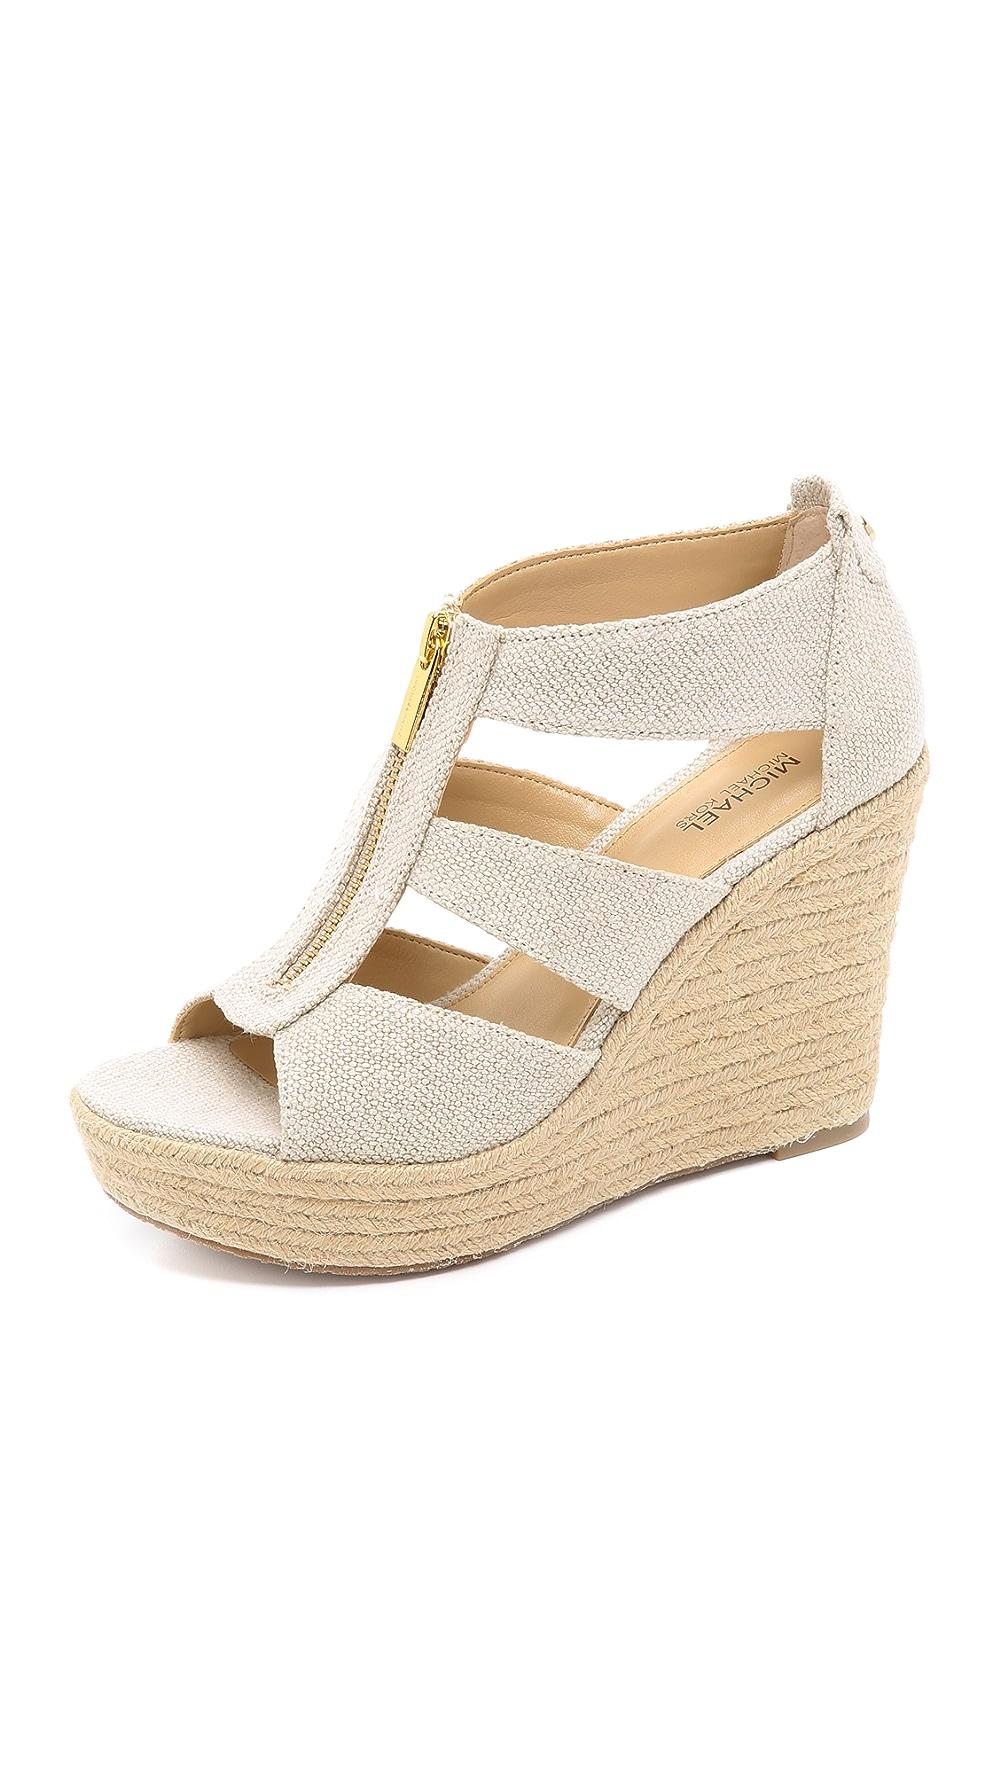 MICHAEL Michael Kors Damita Wedge Sandals | SHOPBOP